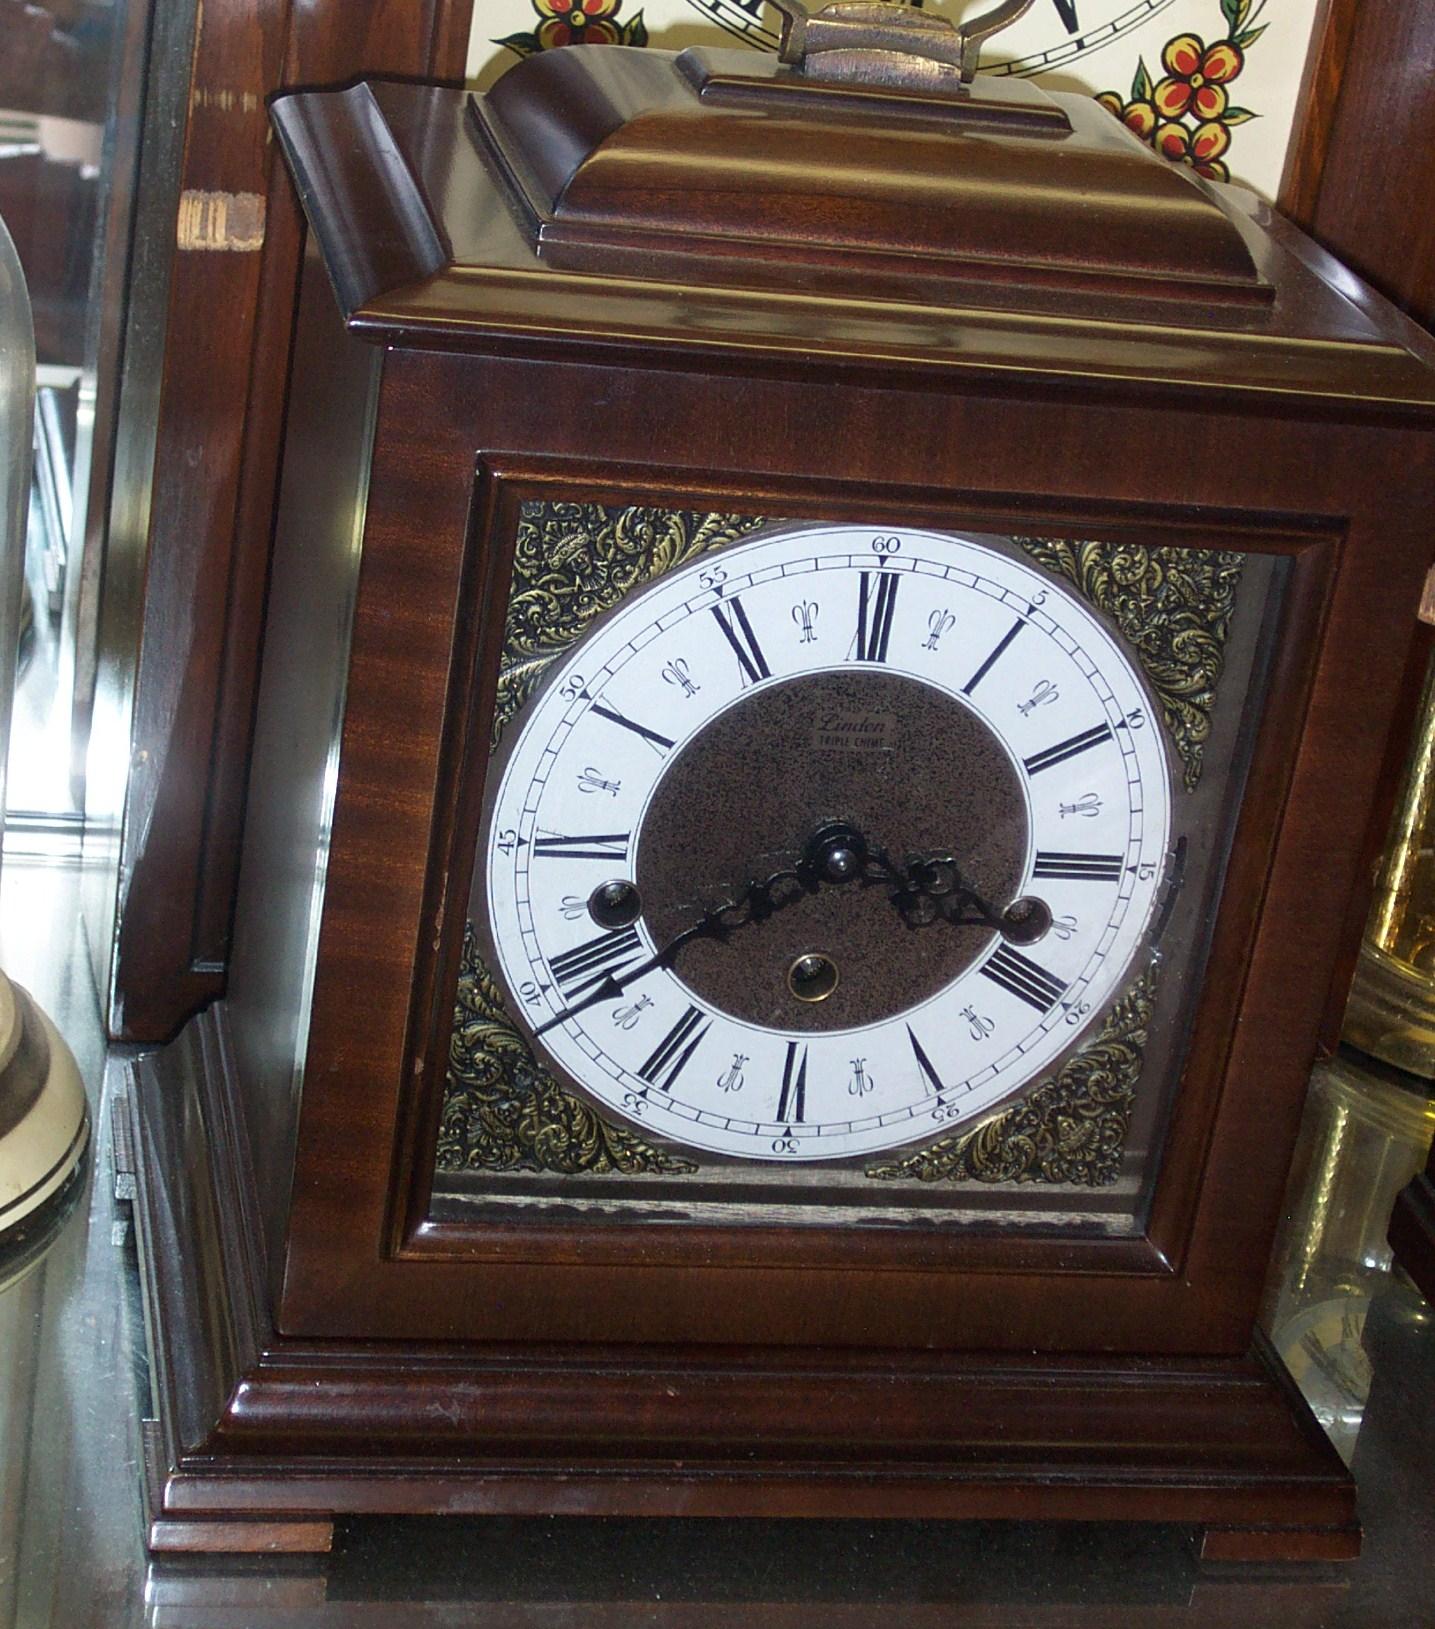 Linden Clocks